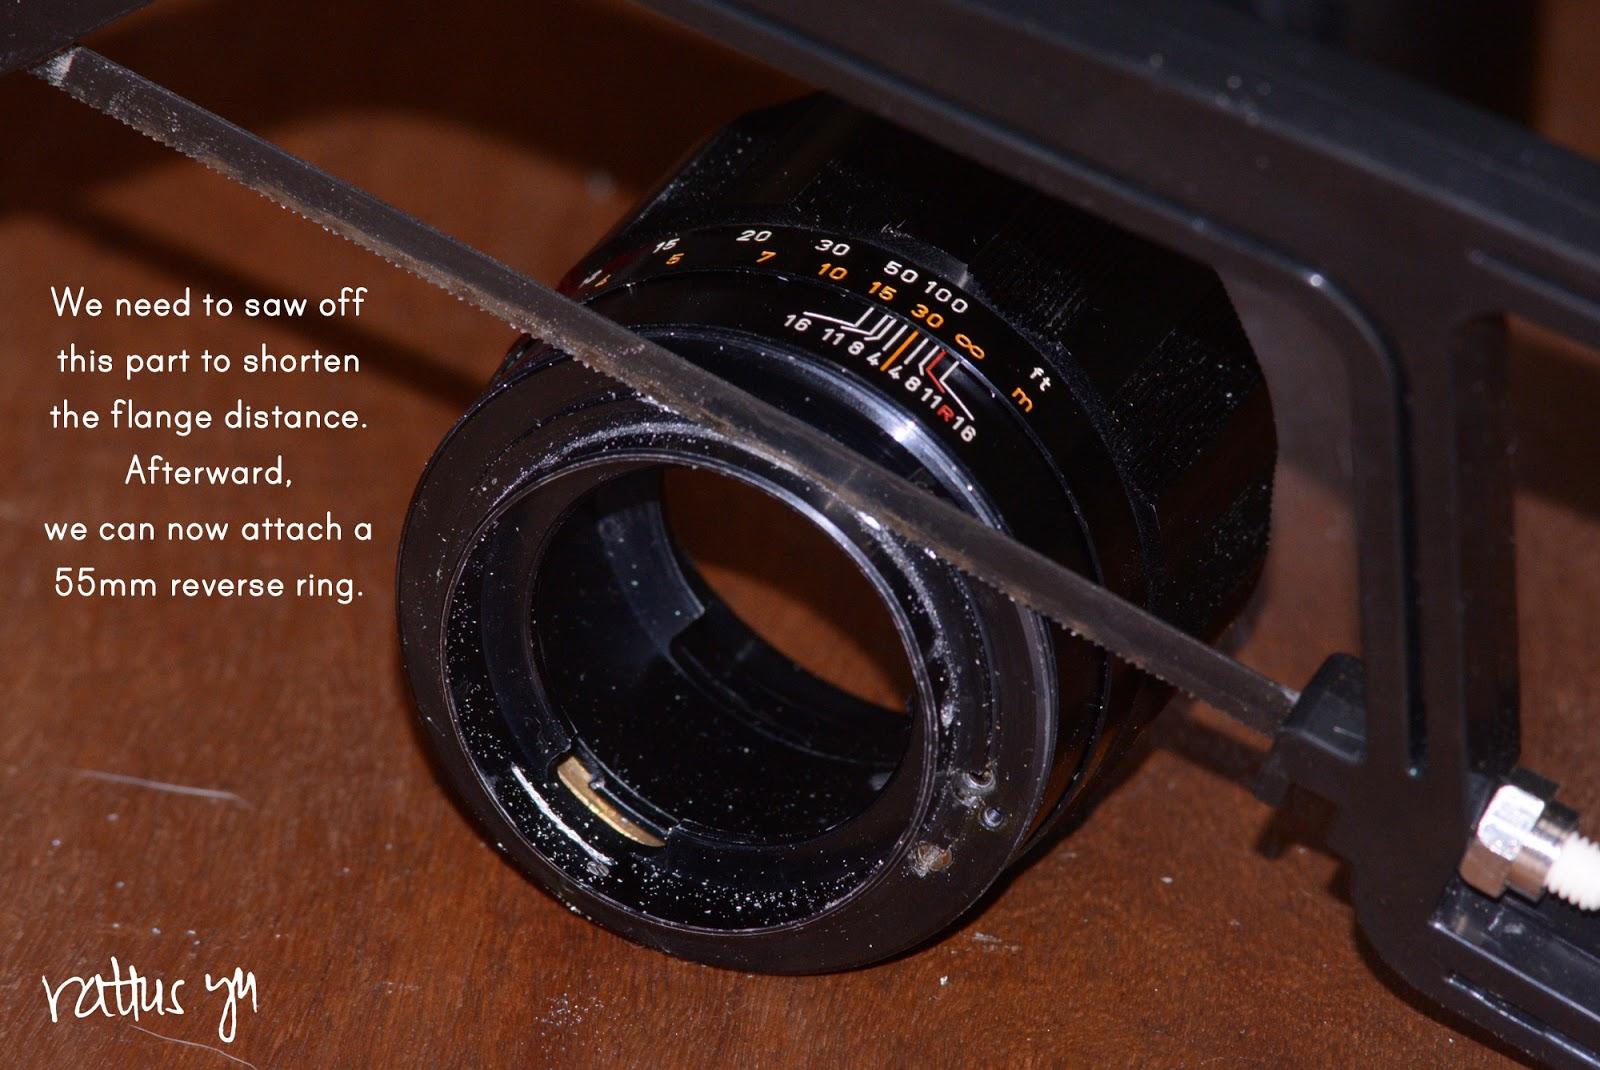 Canon FL 135mm f/2.5, Convert to Nikon F Mount